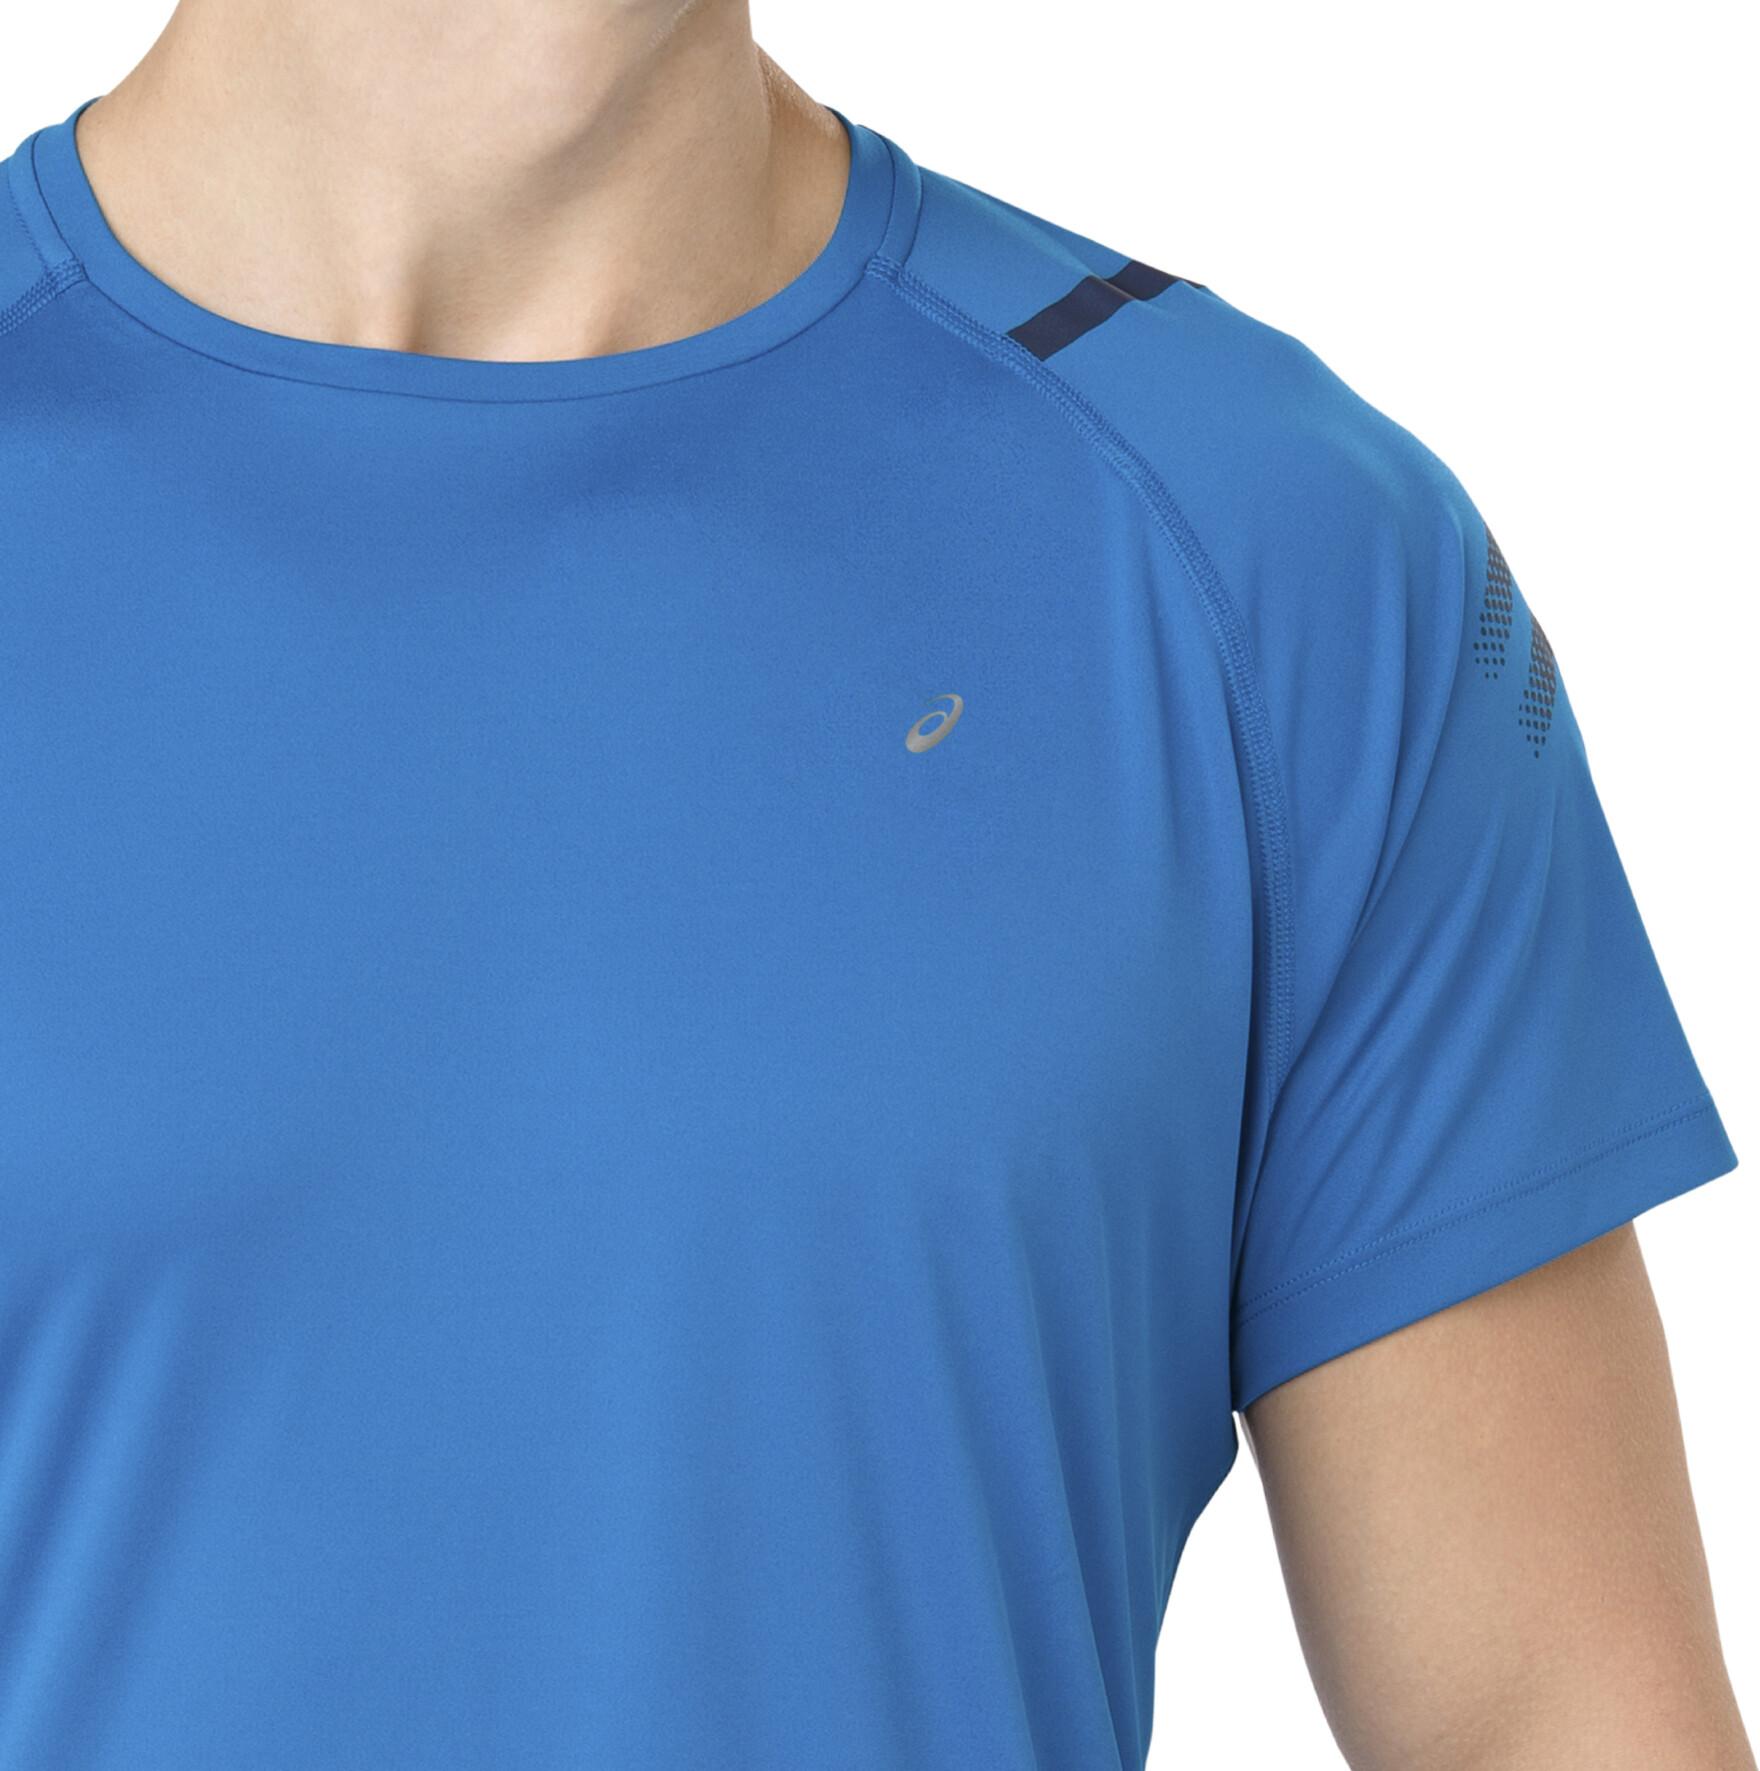 8fd8933e123 asics Icon - T-shirt manches longues running Homme - bleu - Boutique ...